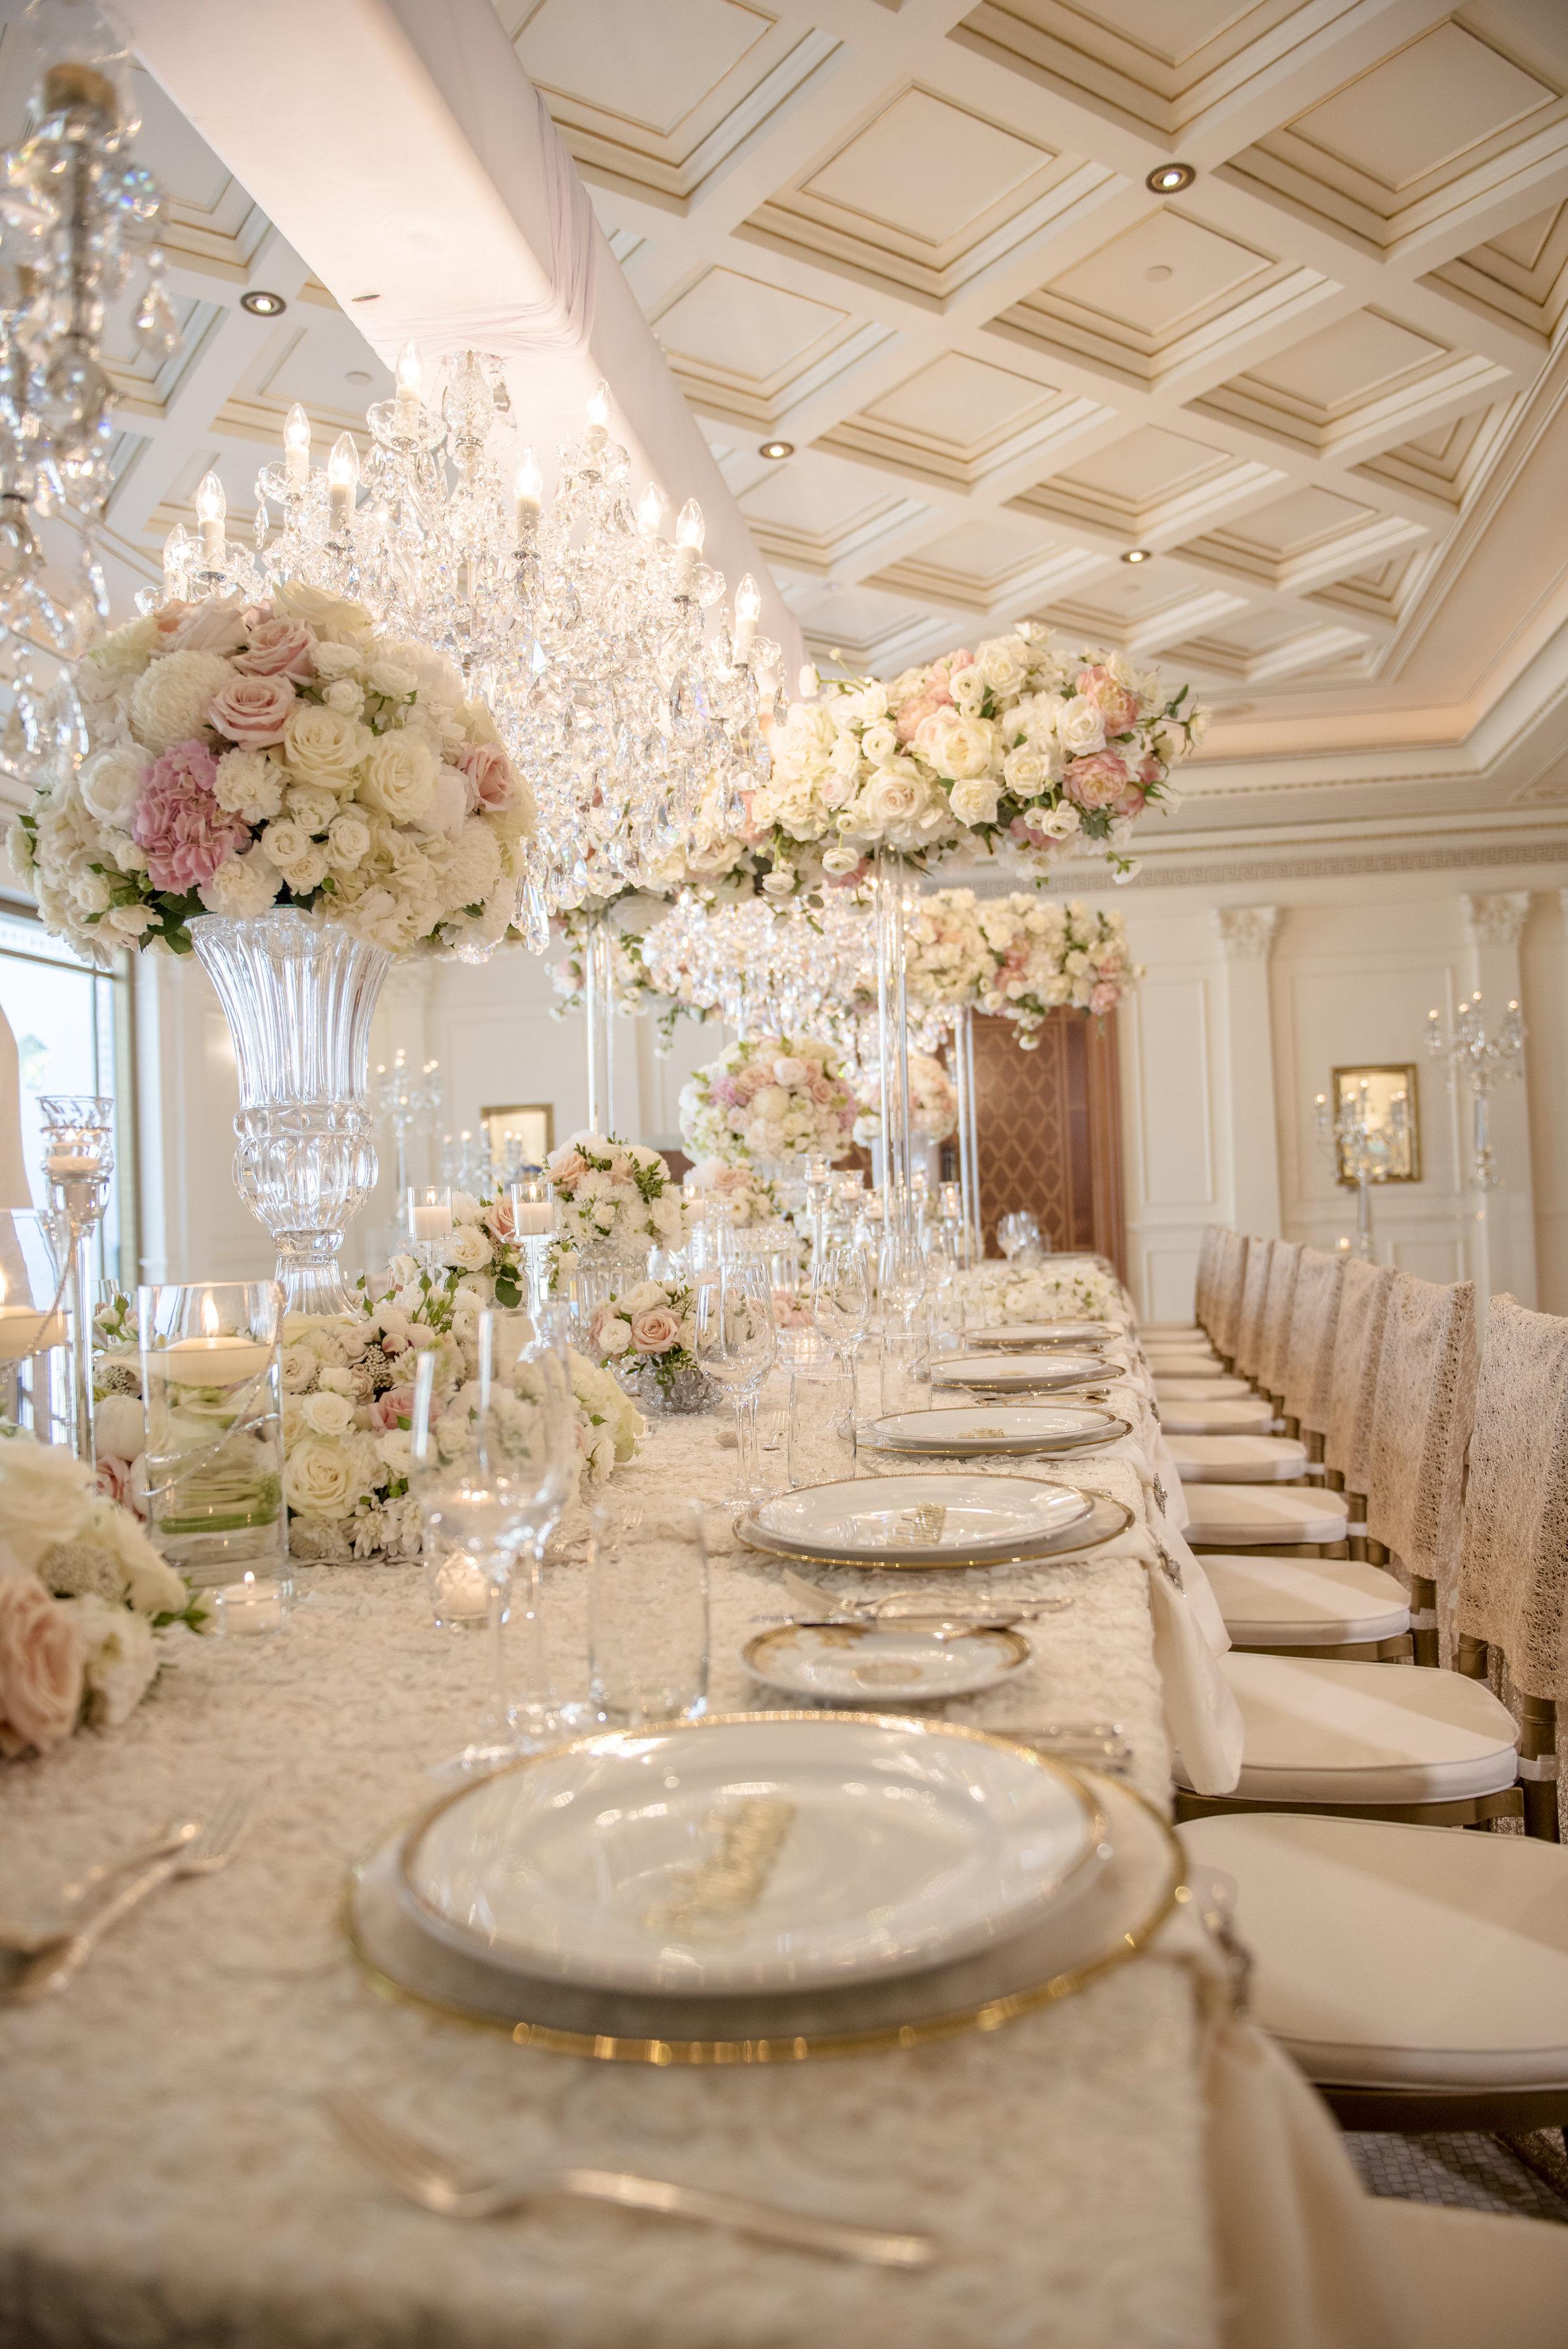 Hire_Ivory_rose_luxury_linen_sydney_wedding_decor_event_Versace_Decor_gold_plates_cutlery.jpg